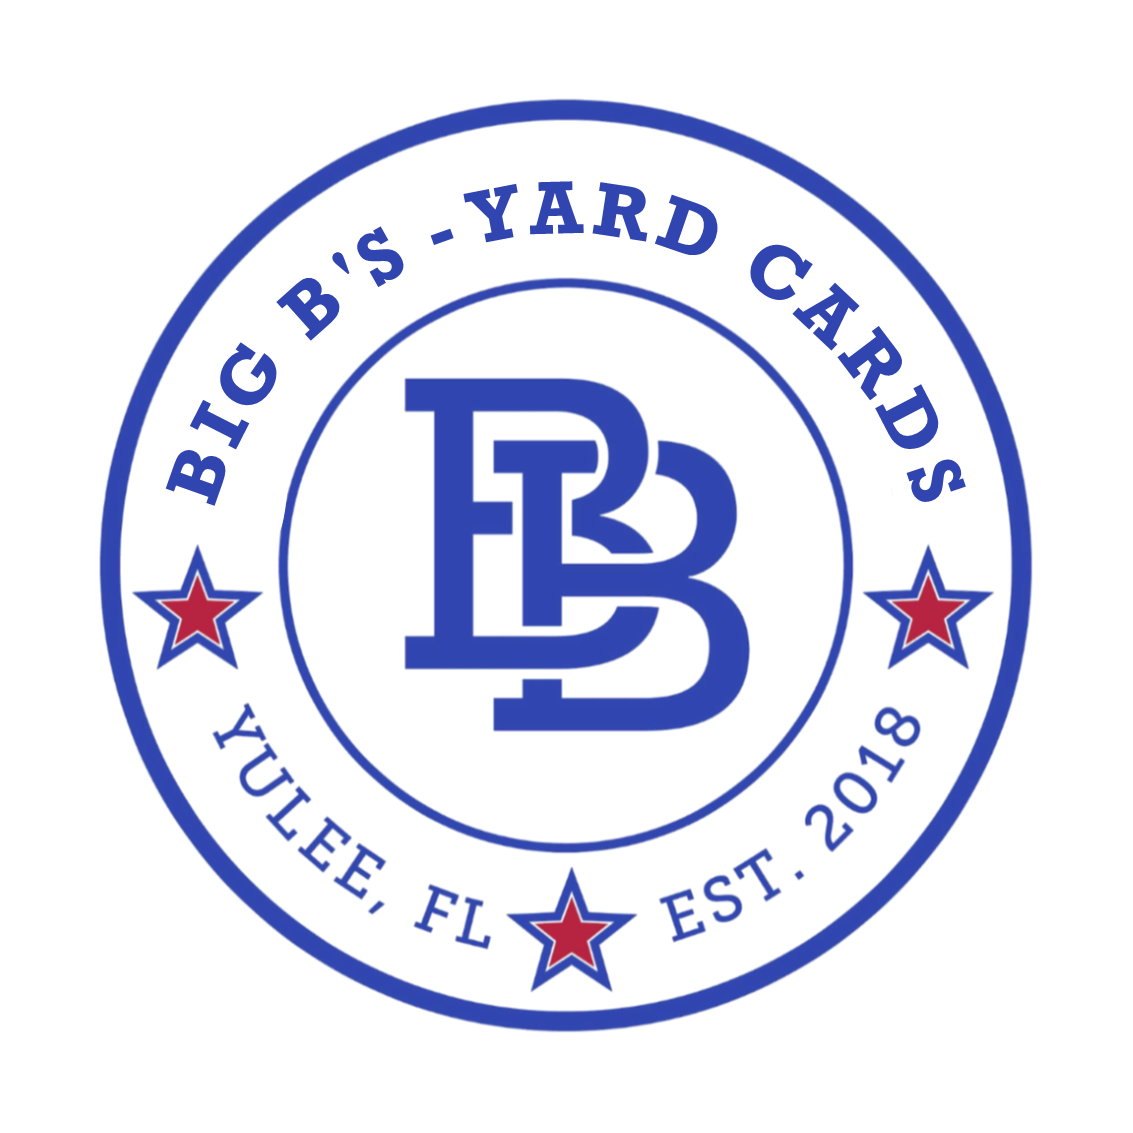 BigB Yard Card Logo.png